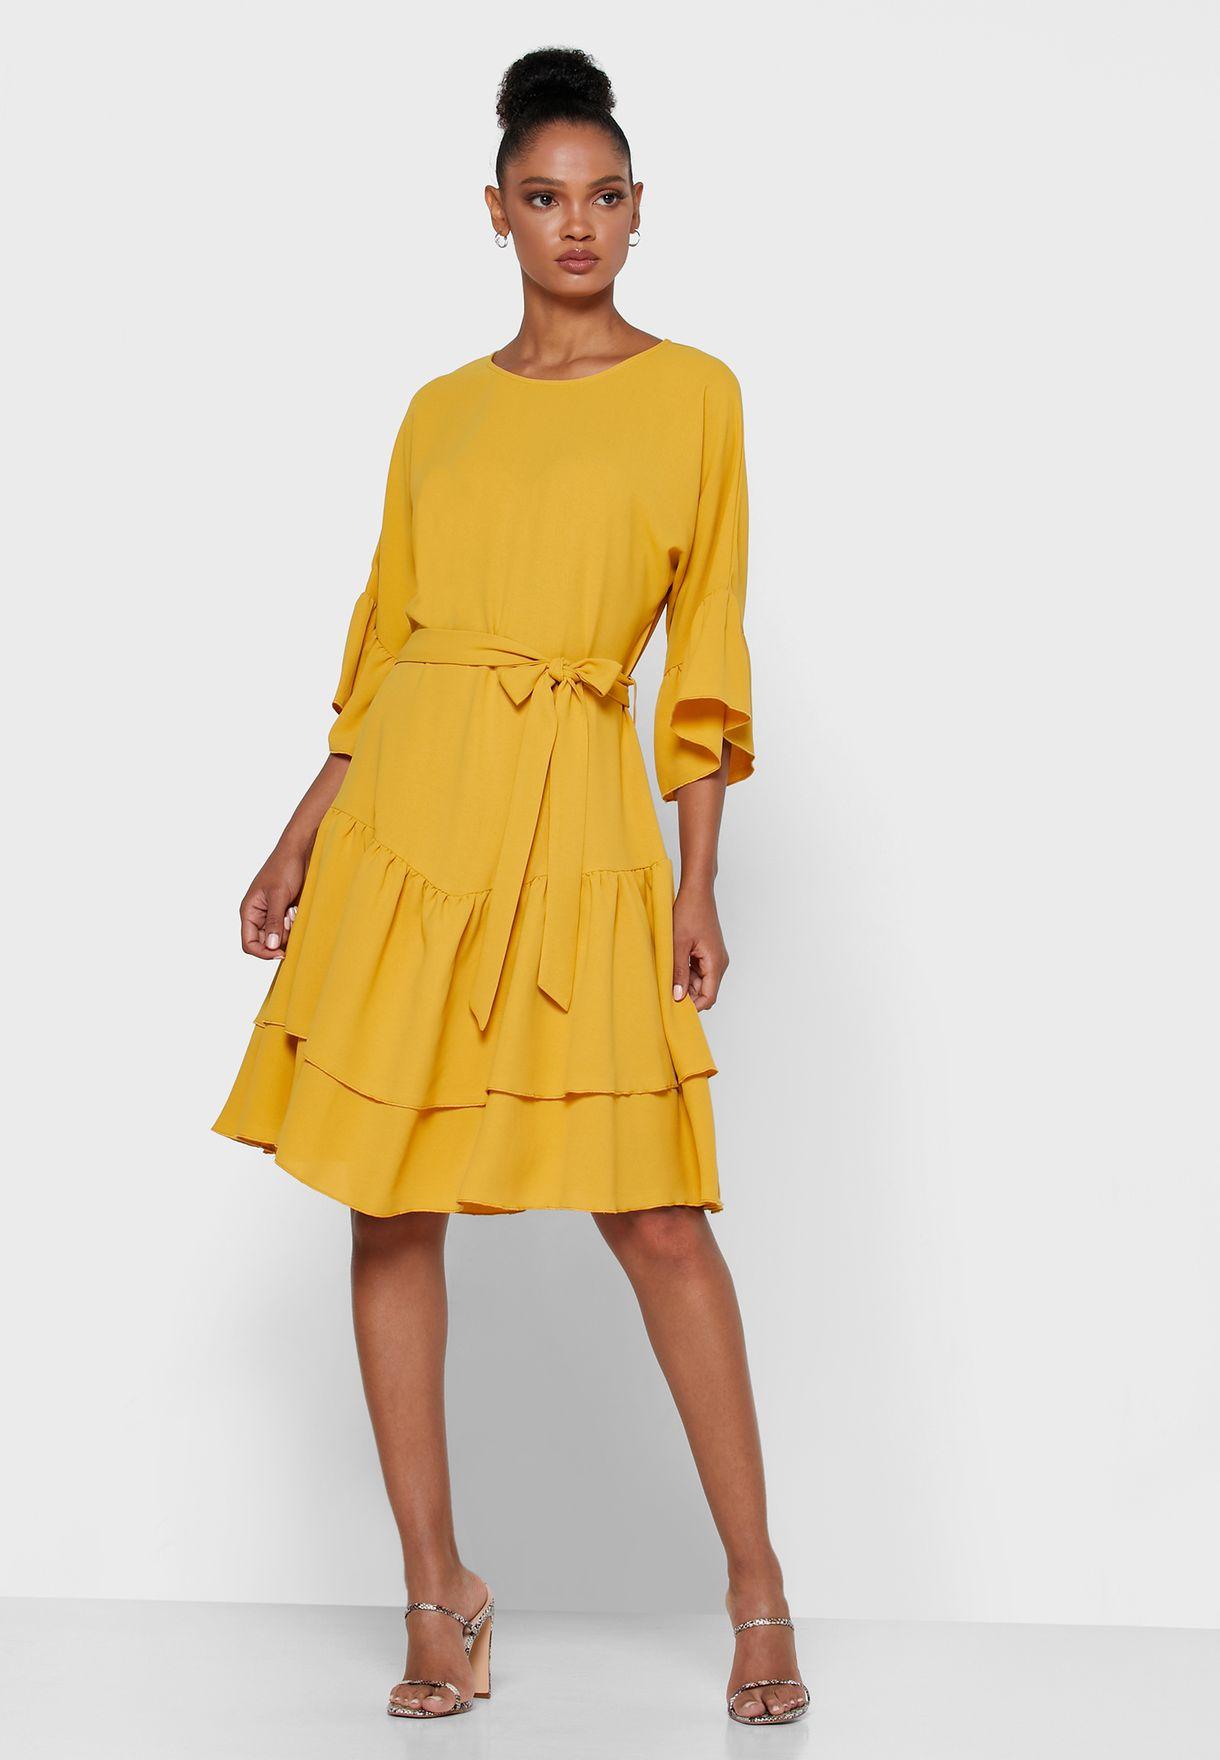 Buy Ginger Yellow Tiered Ruffle Trim Mini Dress For Women, Uae 11096at24mip